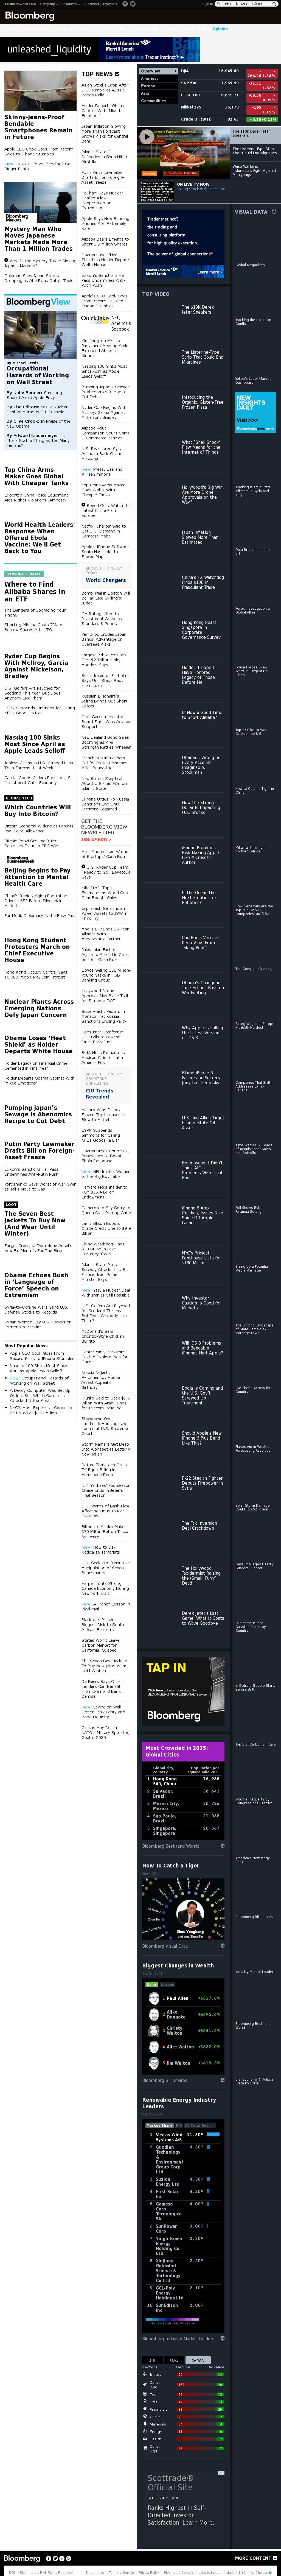 Bloomberg at Friday Sept. 26, 2014, 2 a.m. UTC